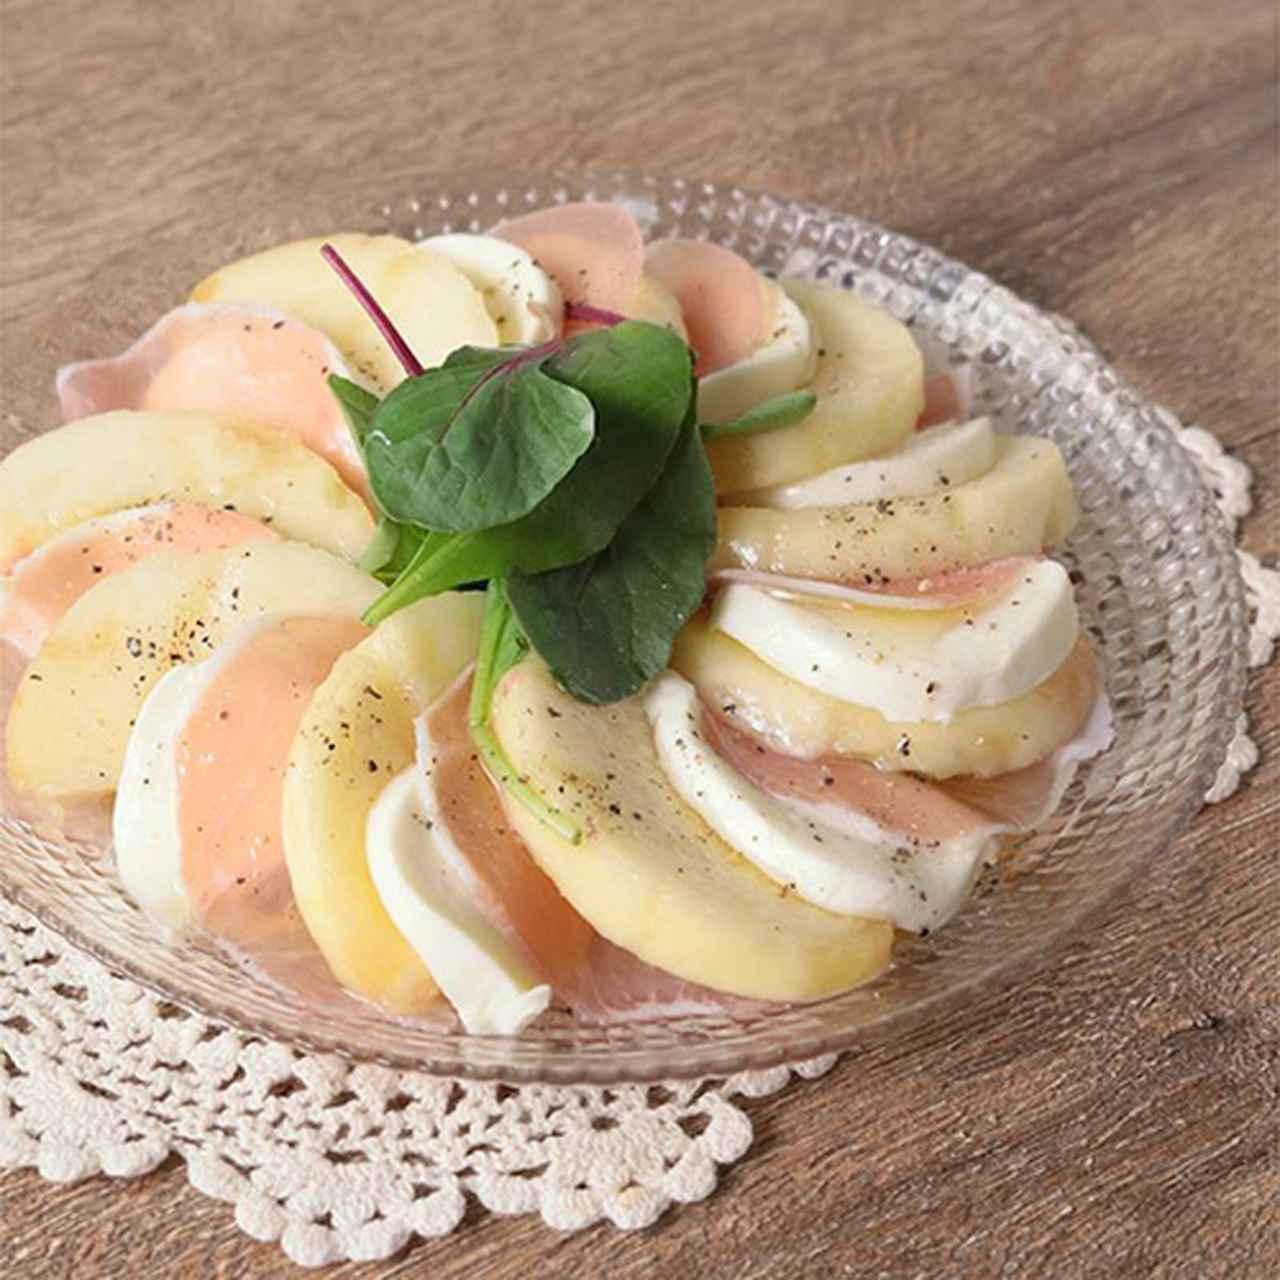 画像: www.kurashiru.com